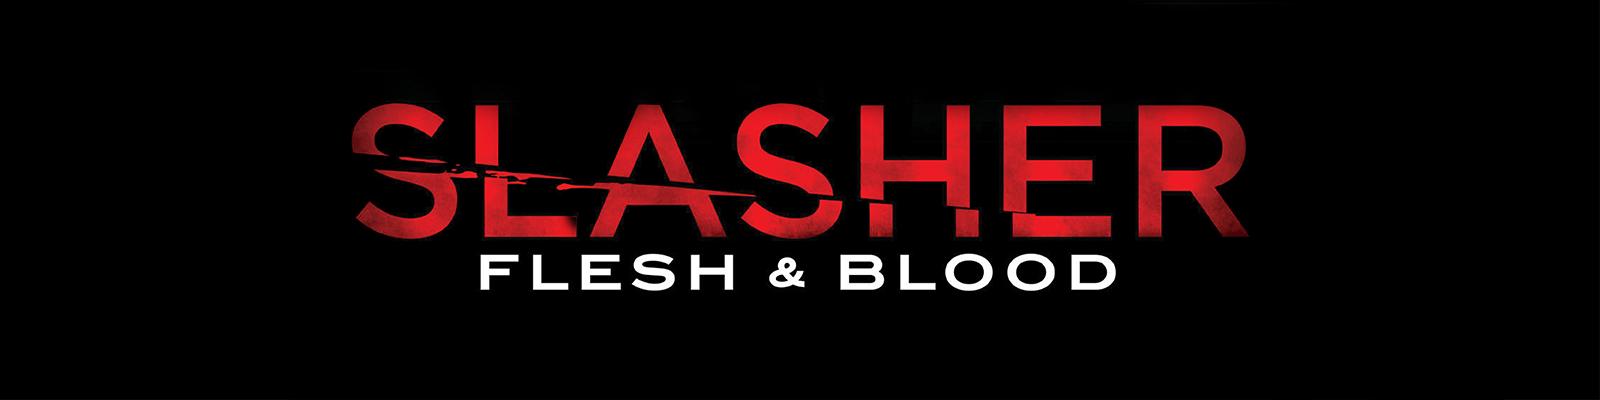 Slasher Flesh and Blood